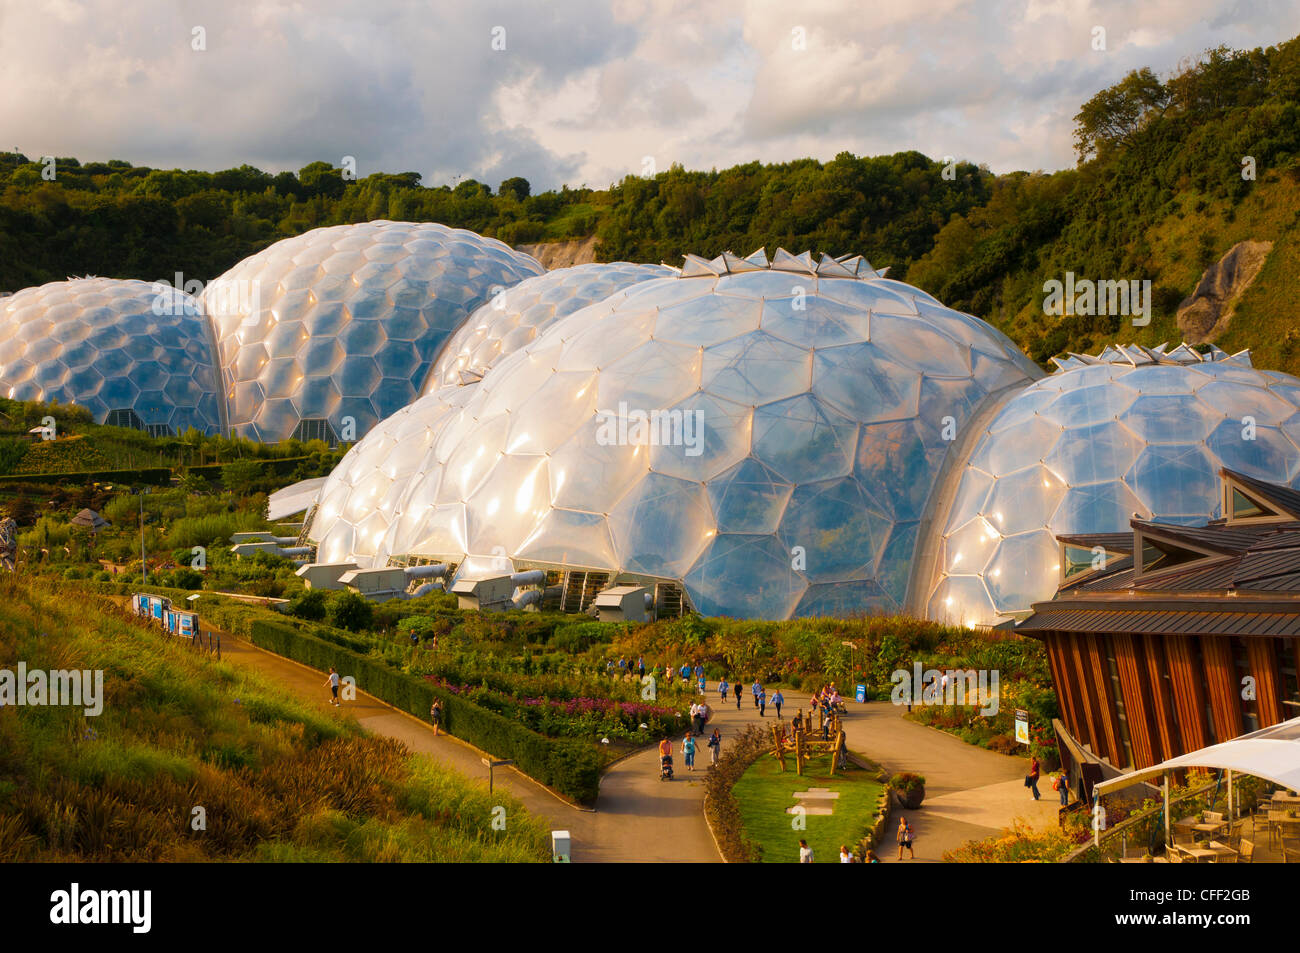 Eden Project near St. Austell, Cornwall, England, United Kingdom, Europe - Stock Image